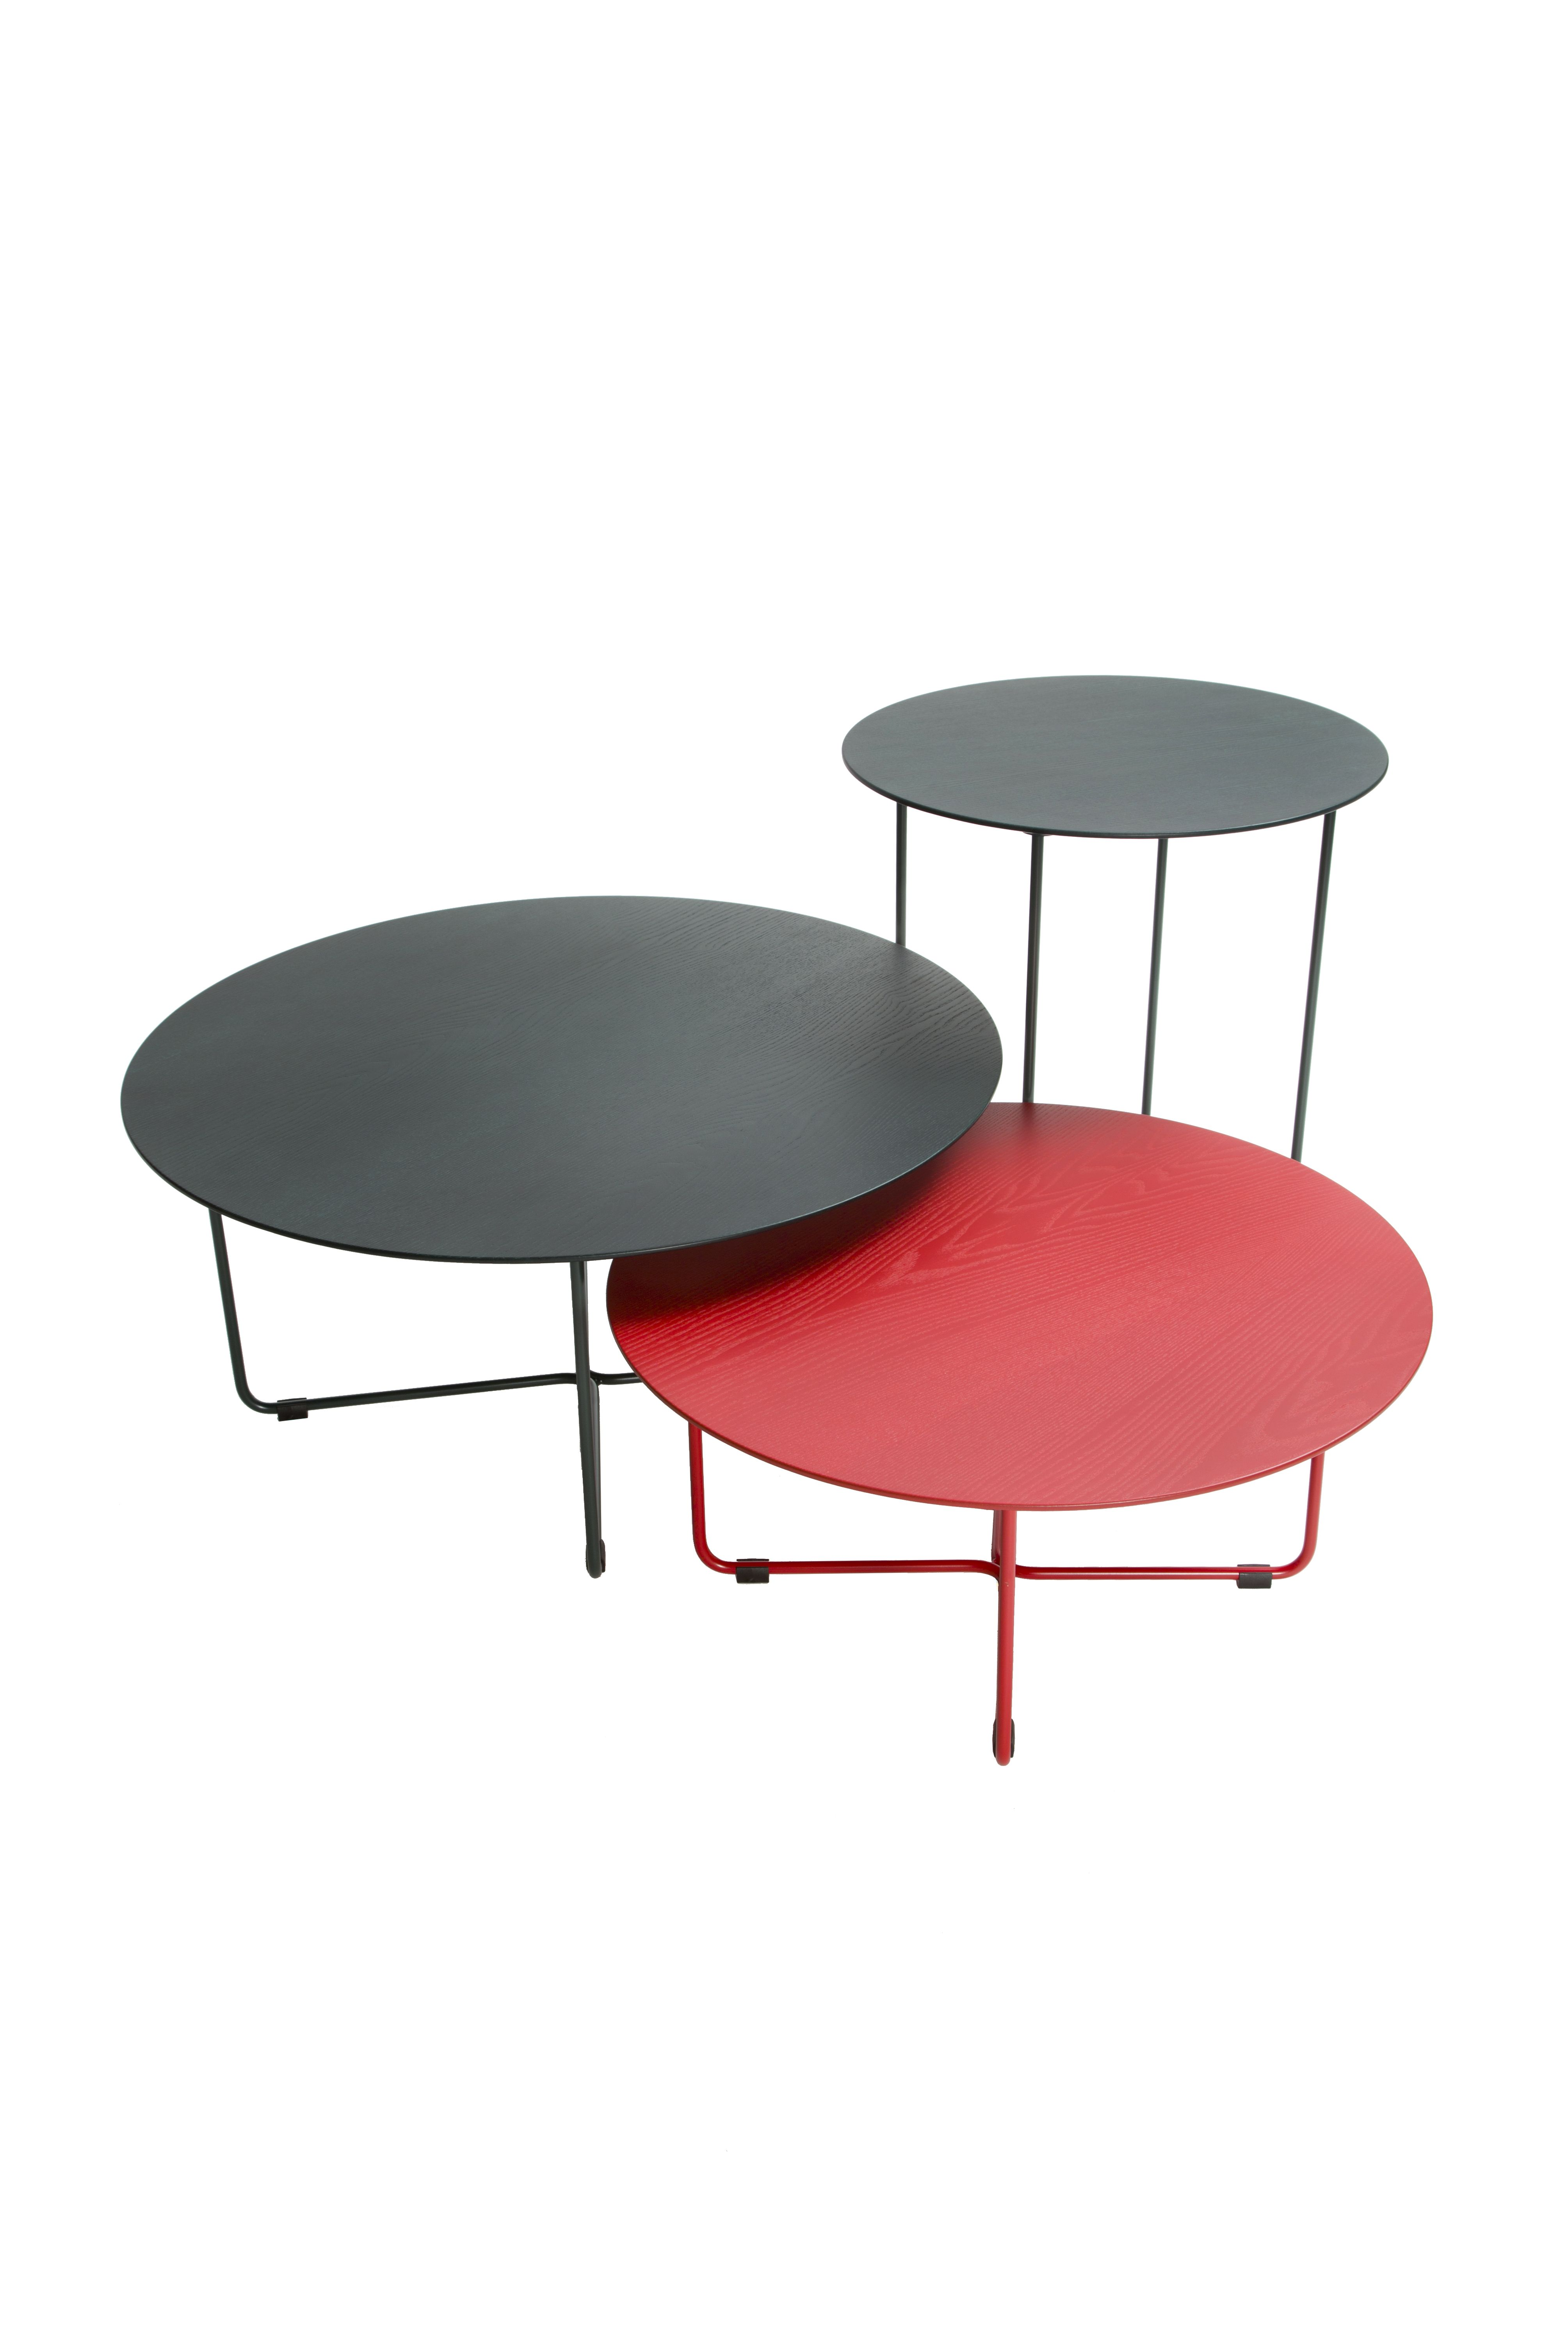 Bondo Round Design Harri Korhonen Table Sustainable Furniture Design Coffee Table [ 6025 x 4017 Pixel ]